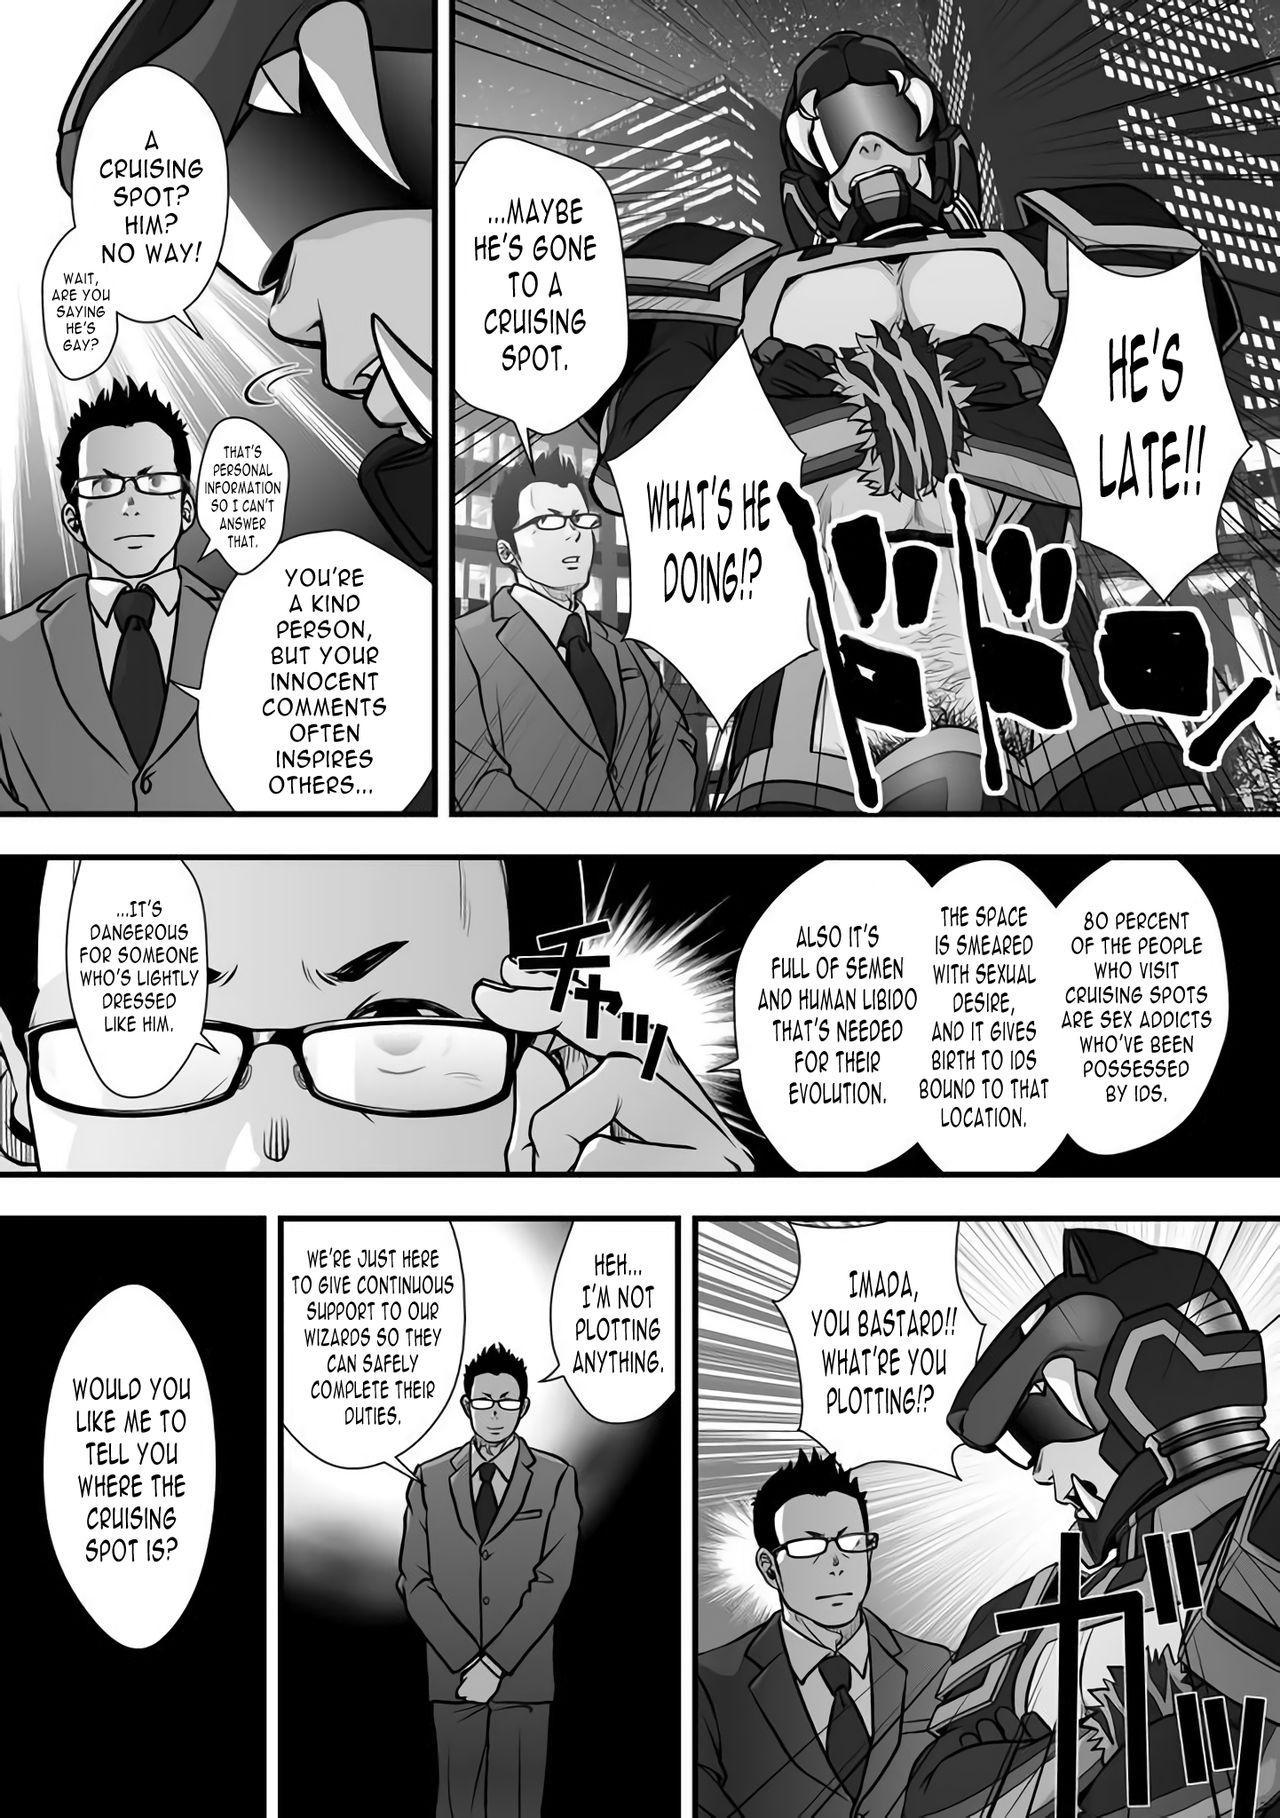 [Pagumiee (Kenta)] Tatakae!+++ (Plus-san)!! [English] [N04h] [Digital] 43